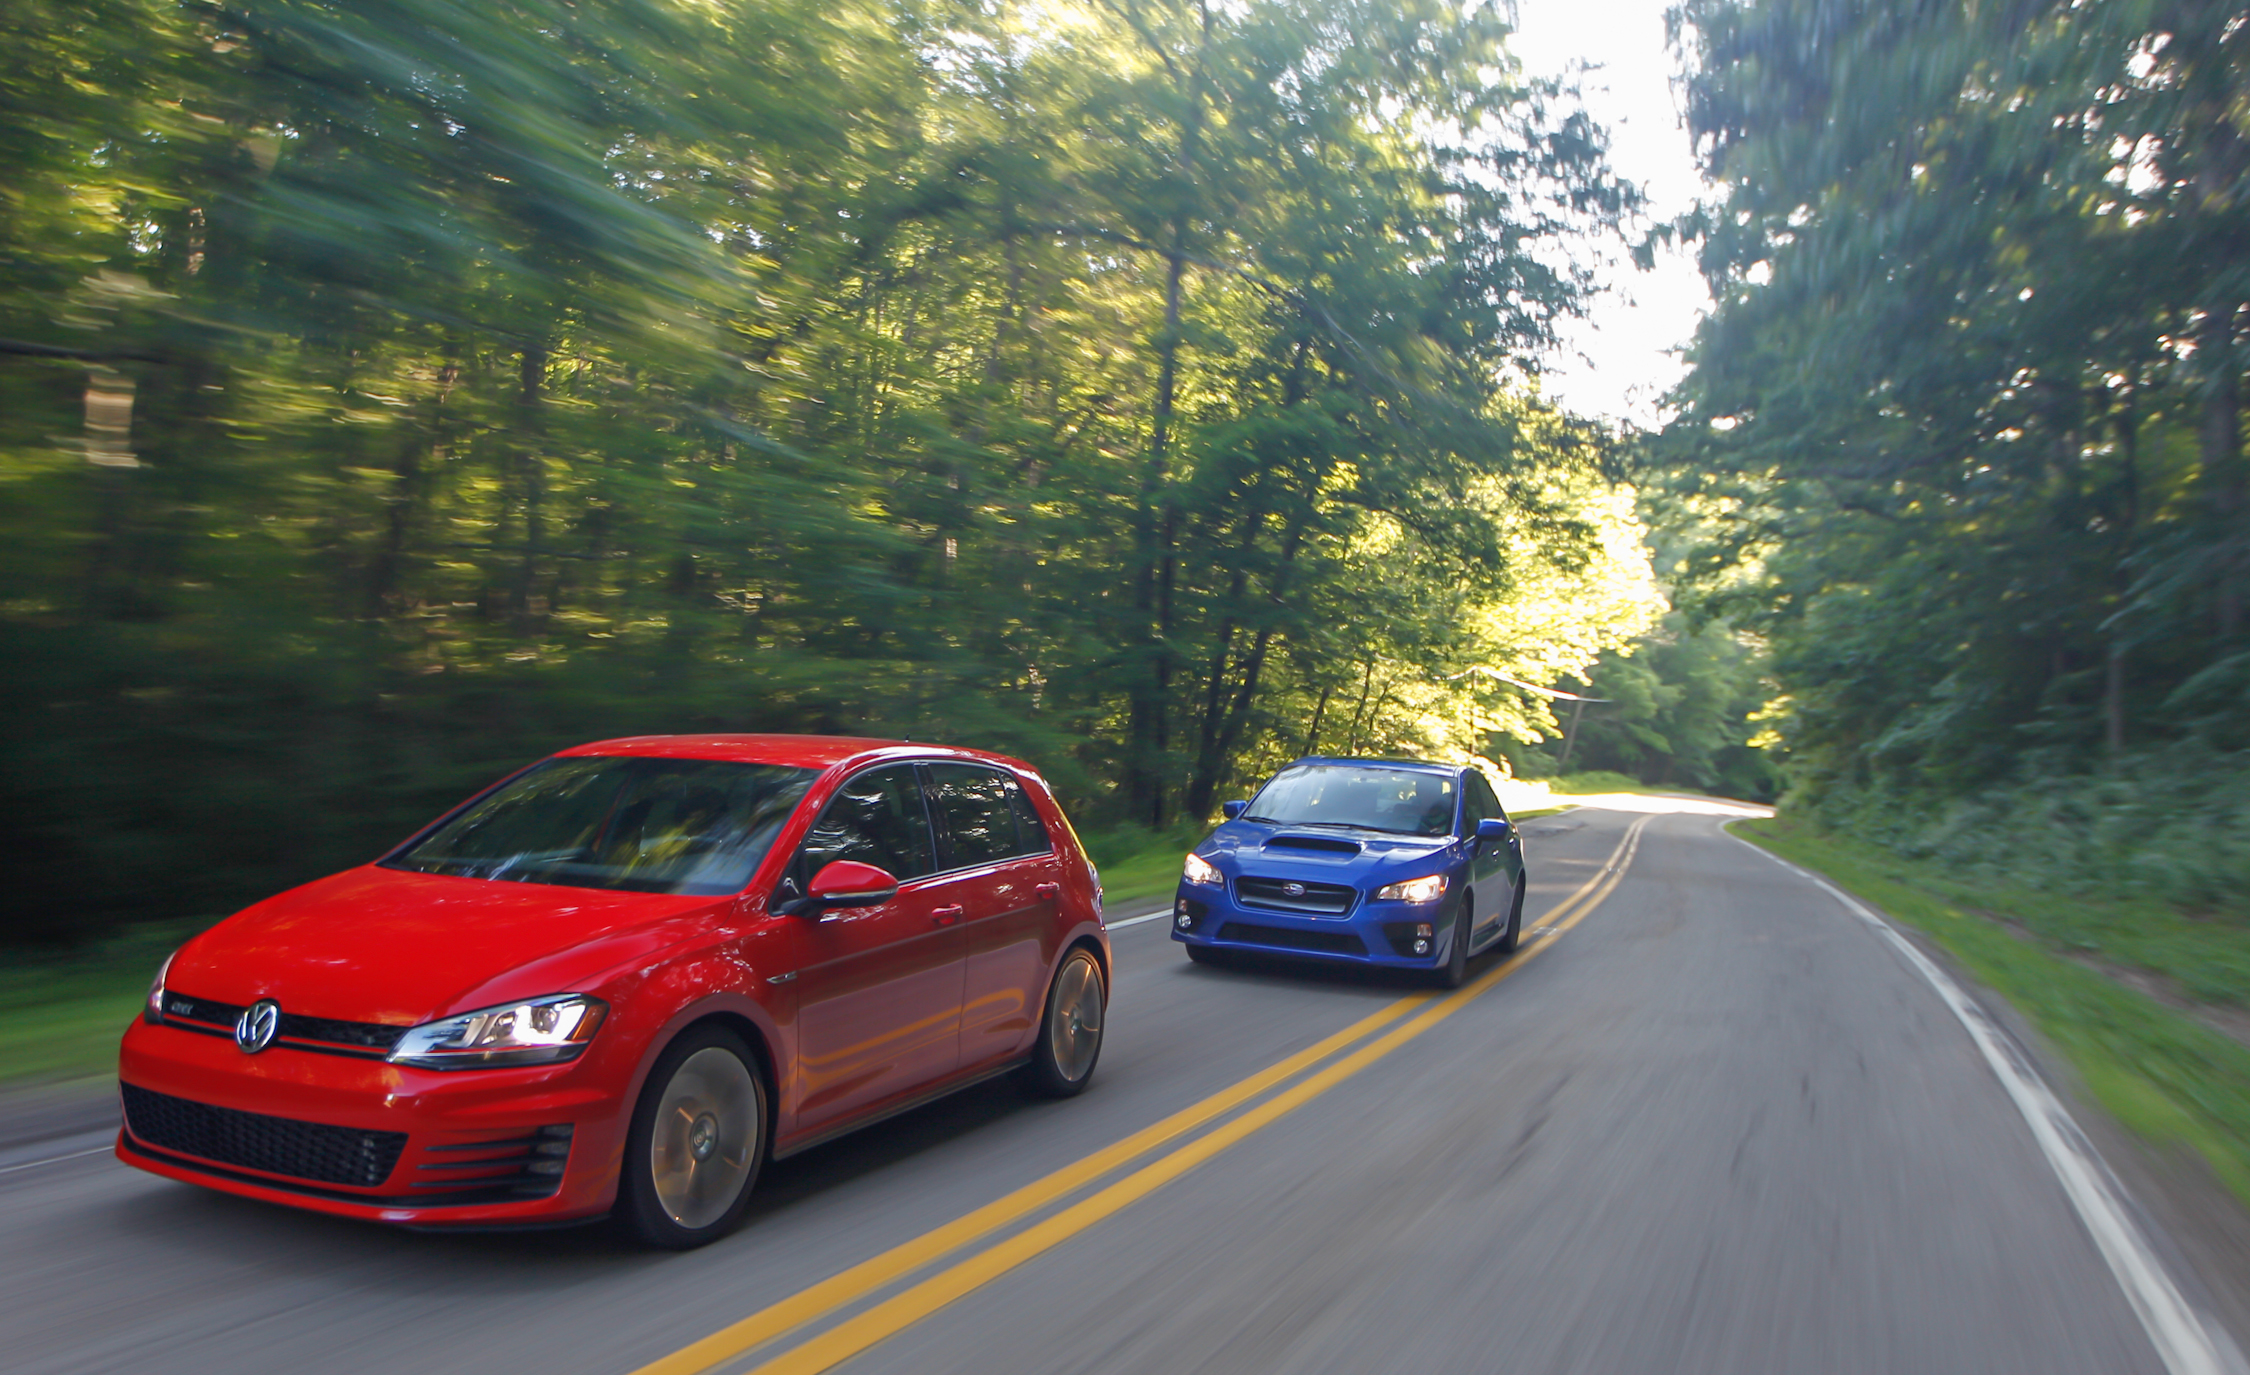 2015 Volkswagen GTI and 2015 Subaru WRX Exterior Preview